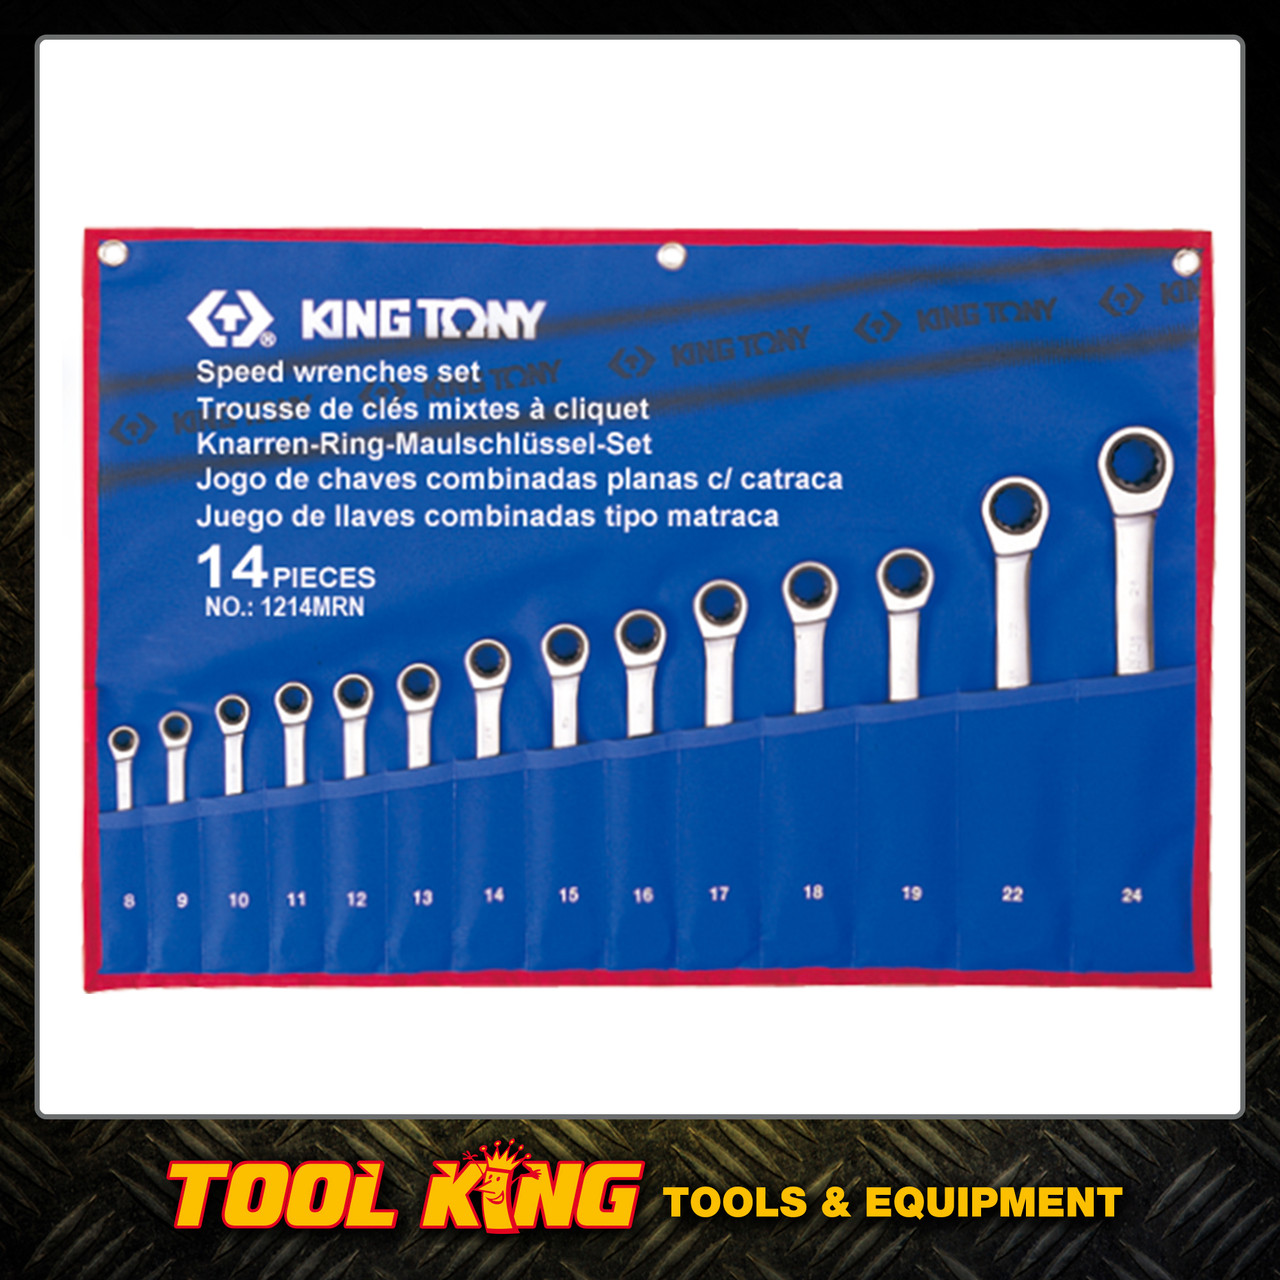 KING TONY 14pc Ratchet Spanner Set Metric